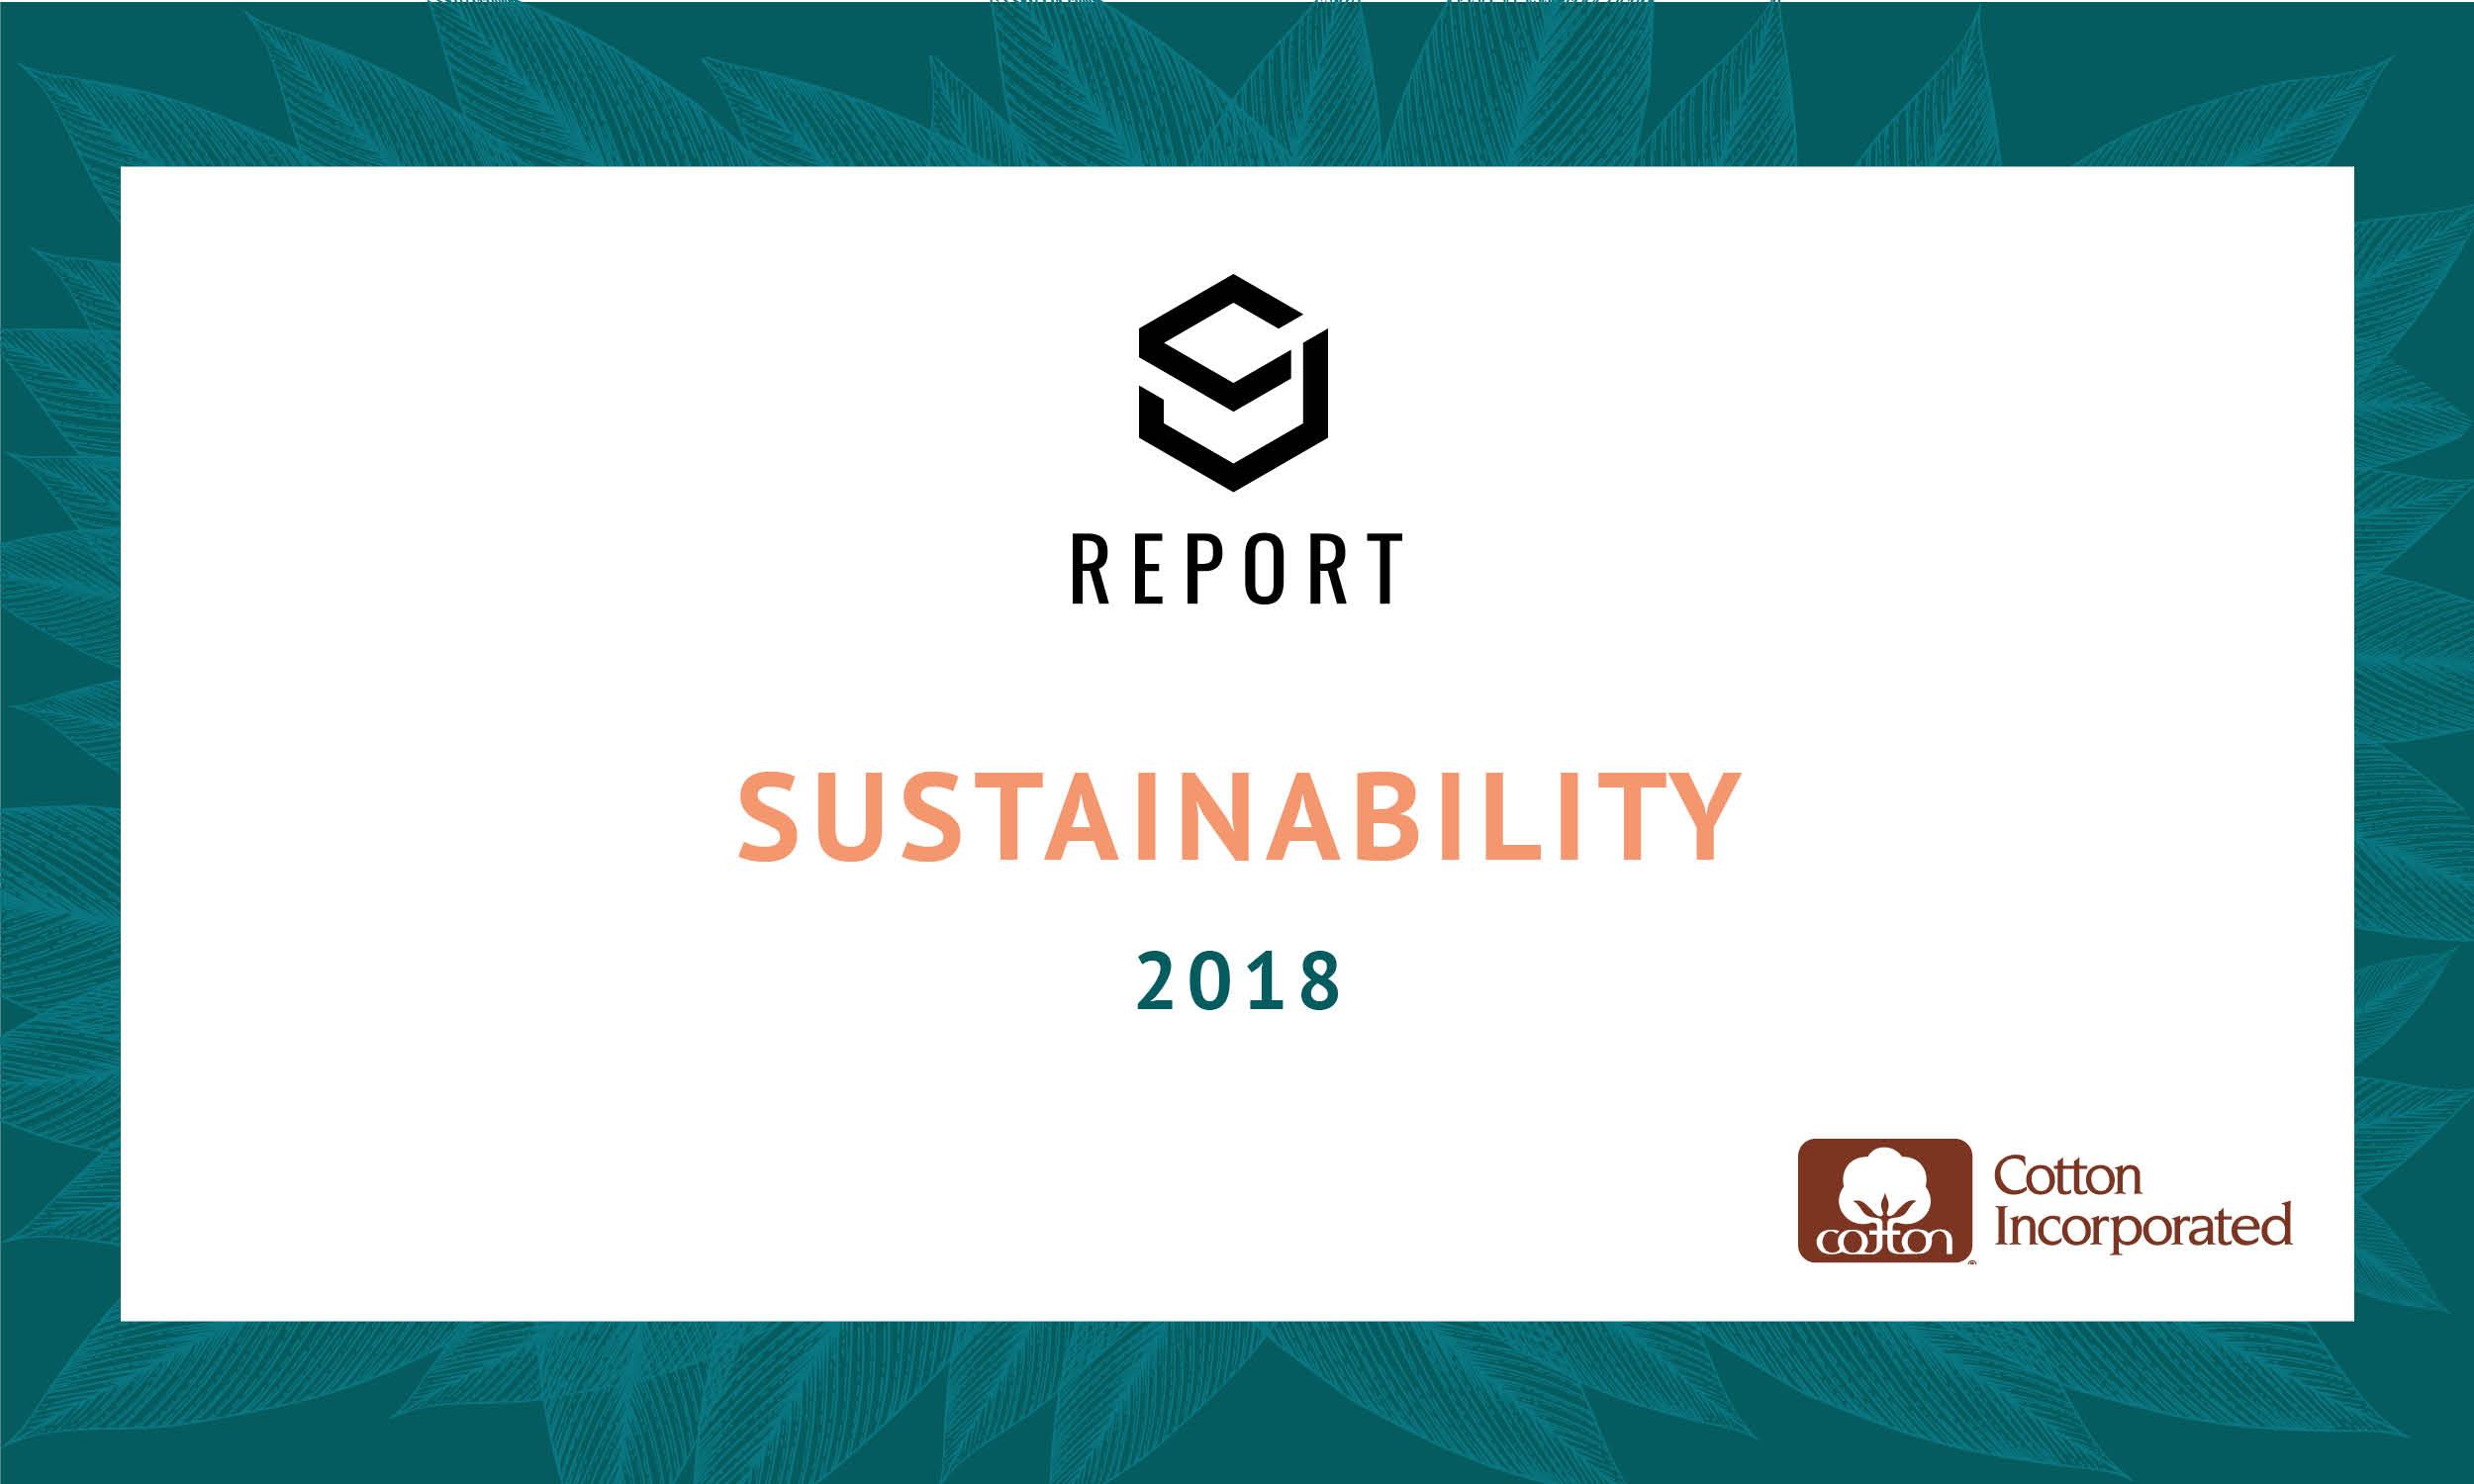 SJ Report: Sustainability